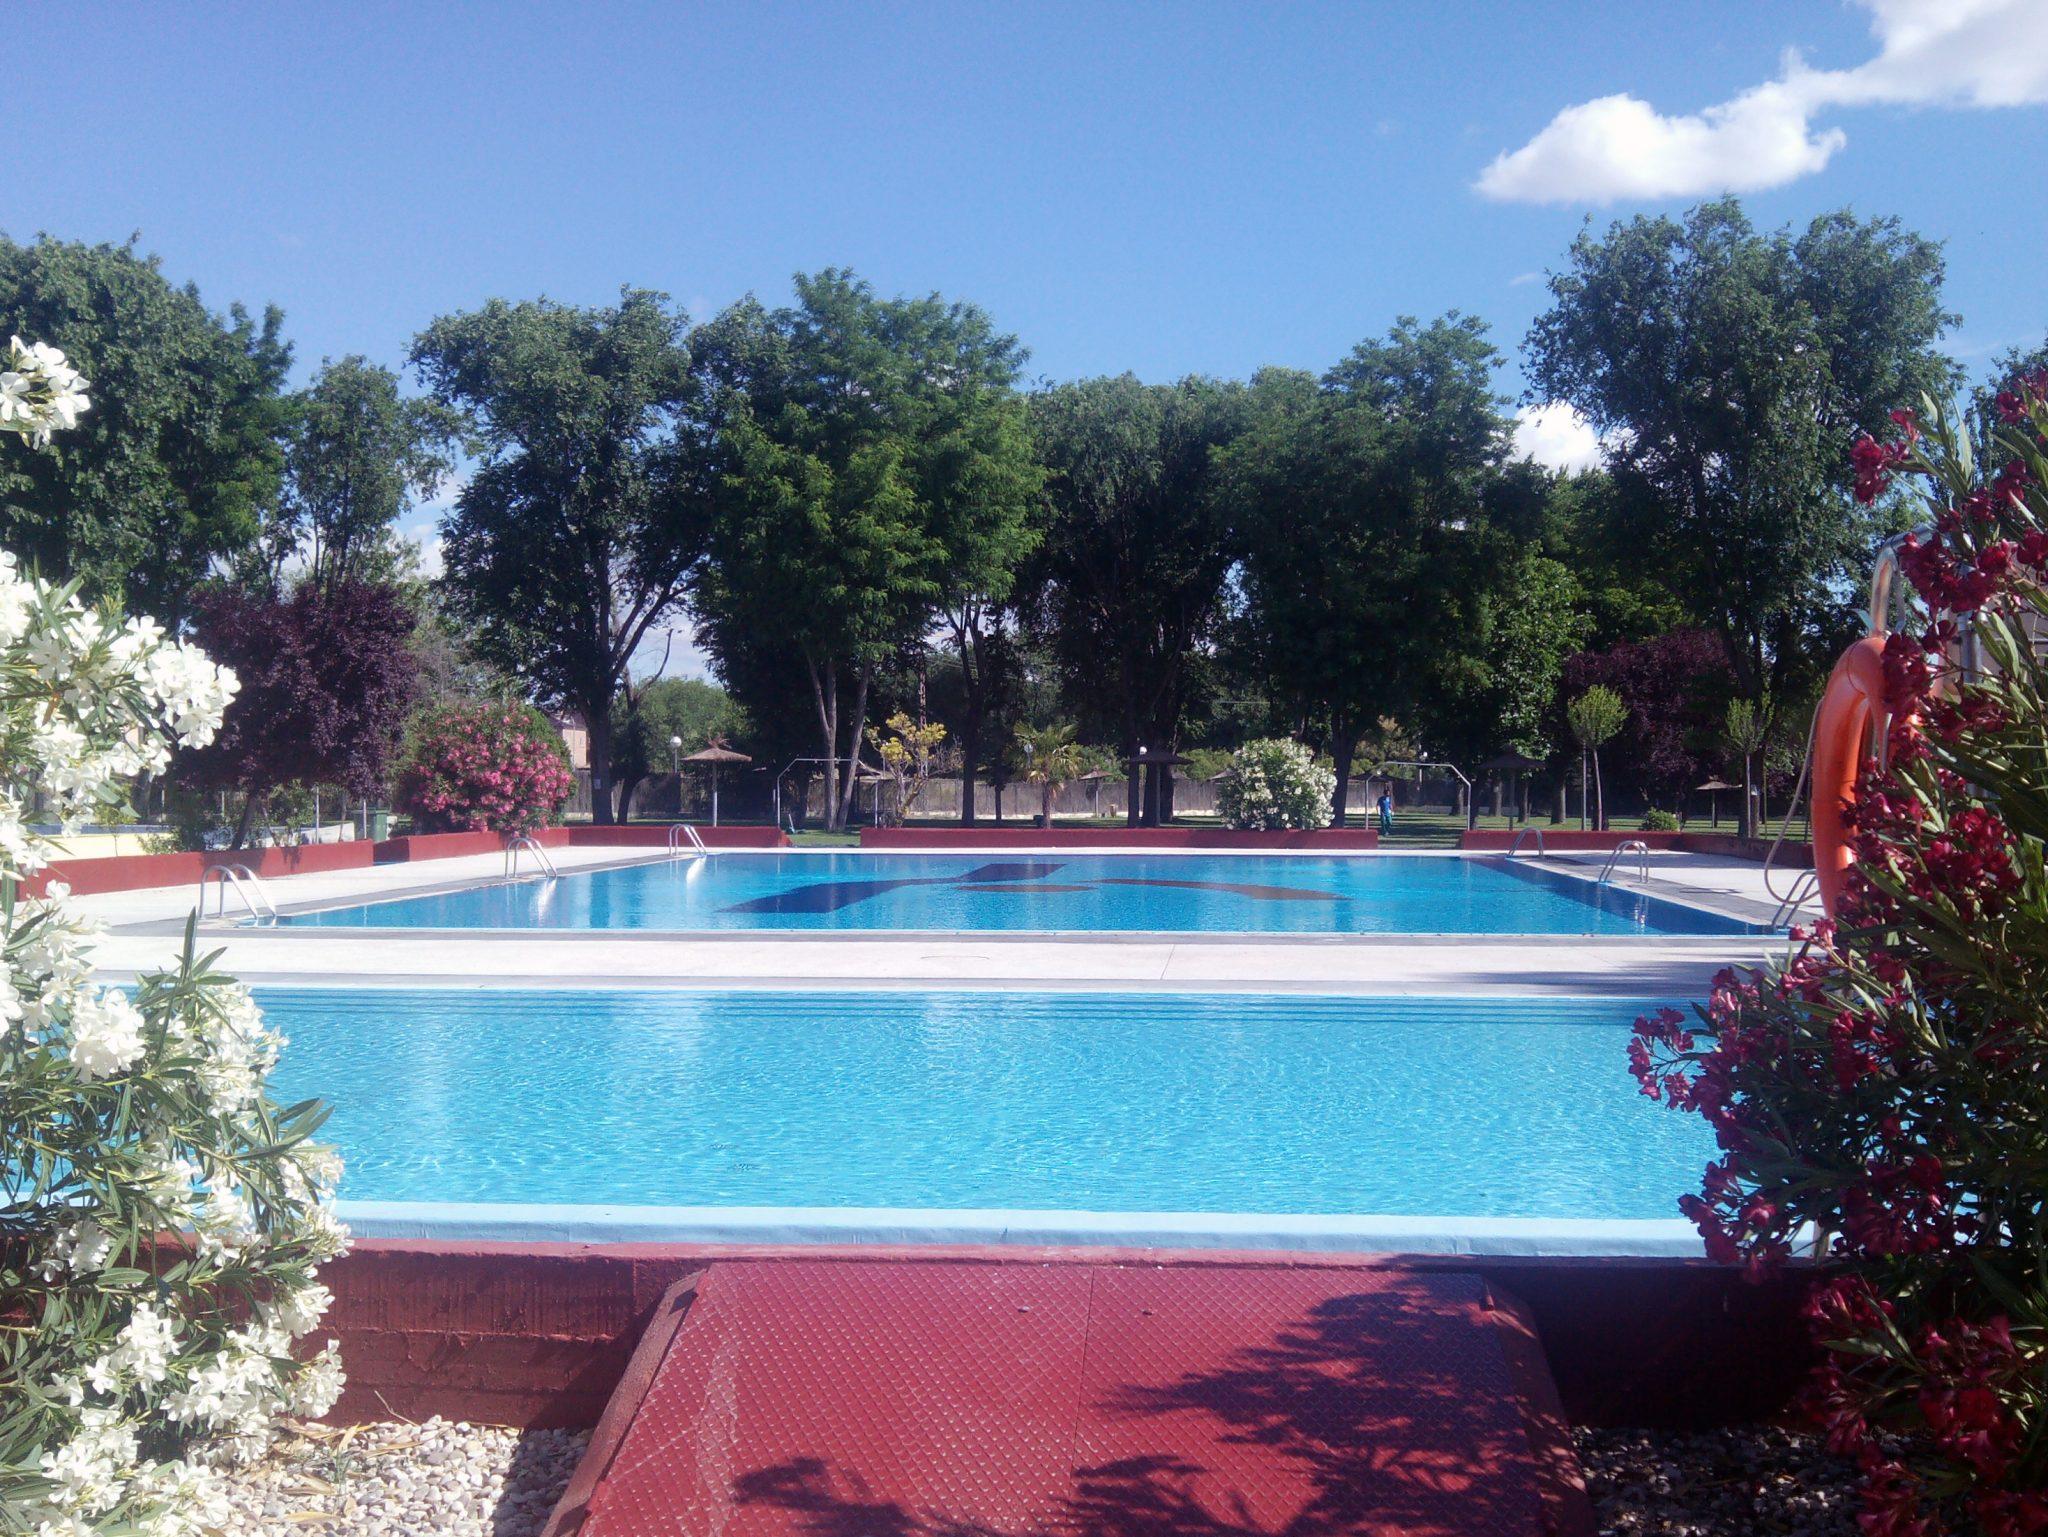 Apertura piscina temporada de verano 2017 aserpinto for Liquidacion piscinas desmontables